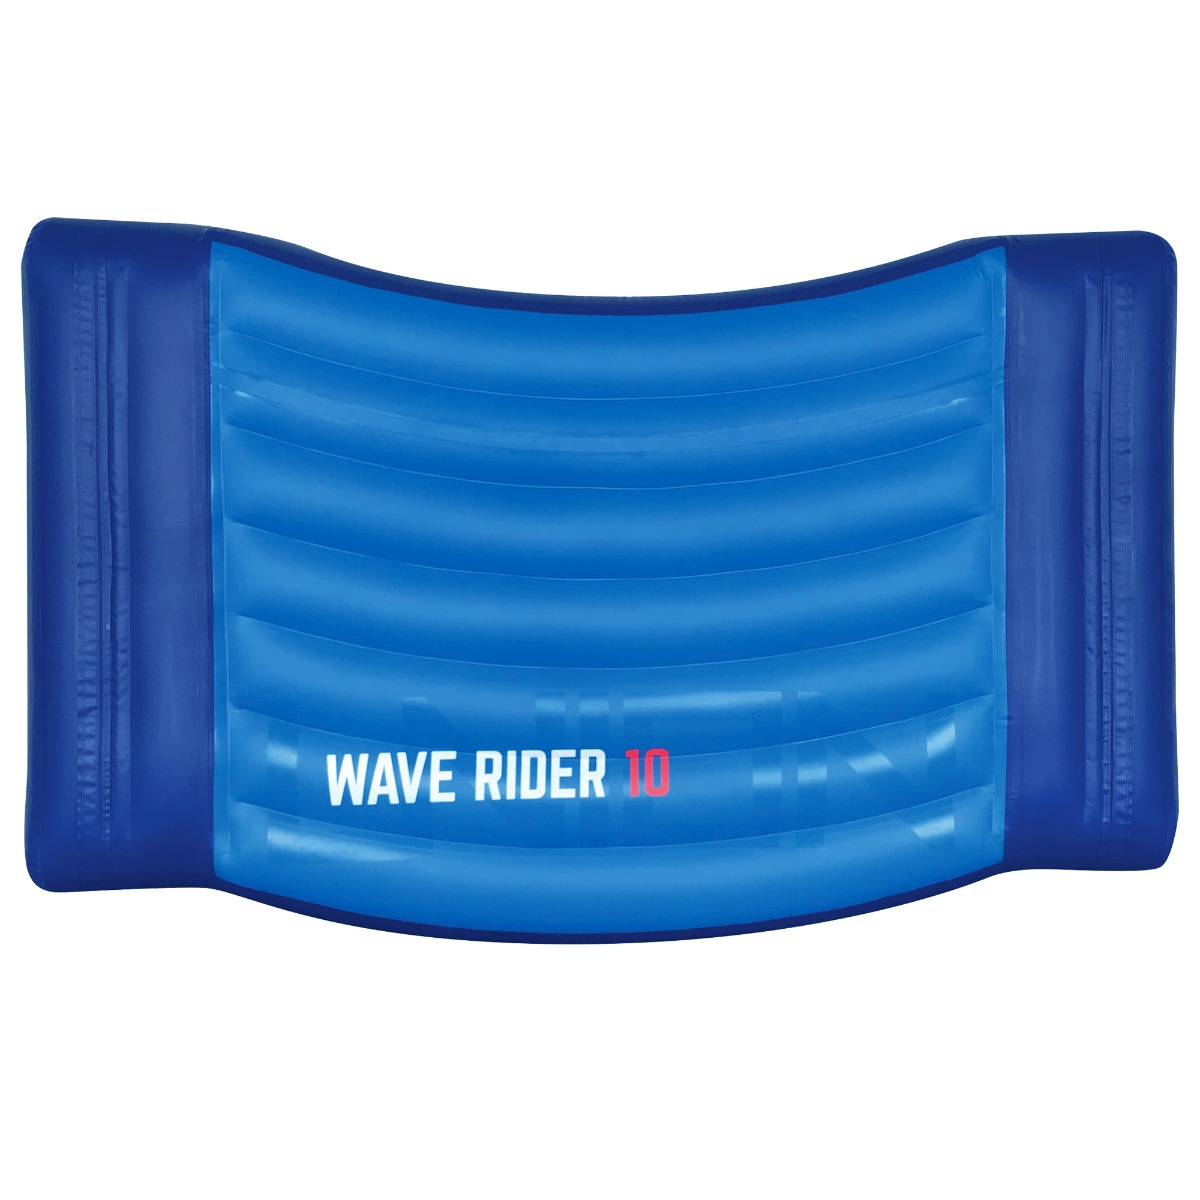 User Manual: Union Aquaparks Wave Rider 10